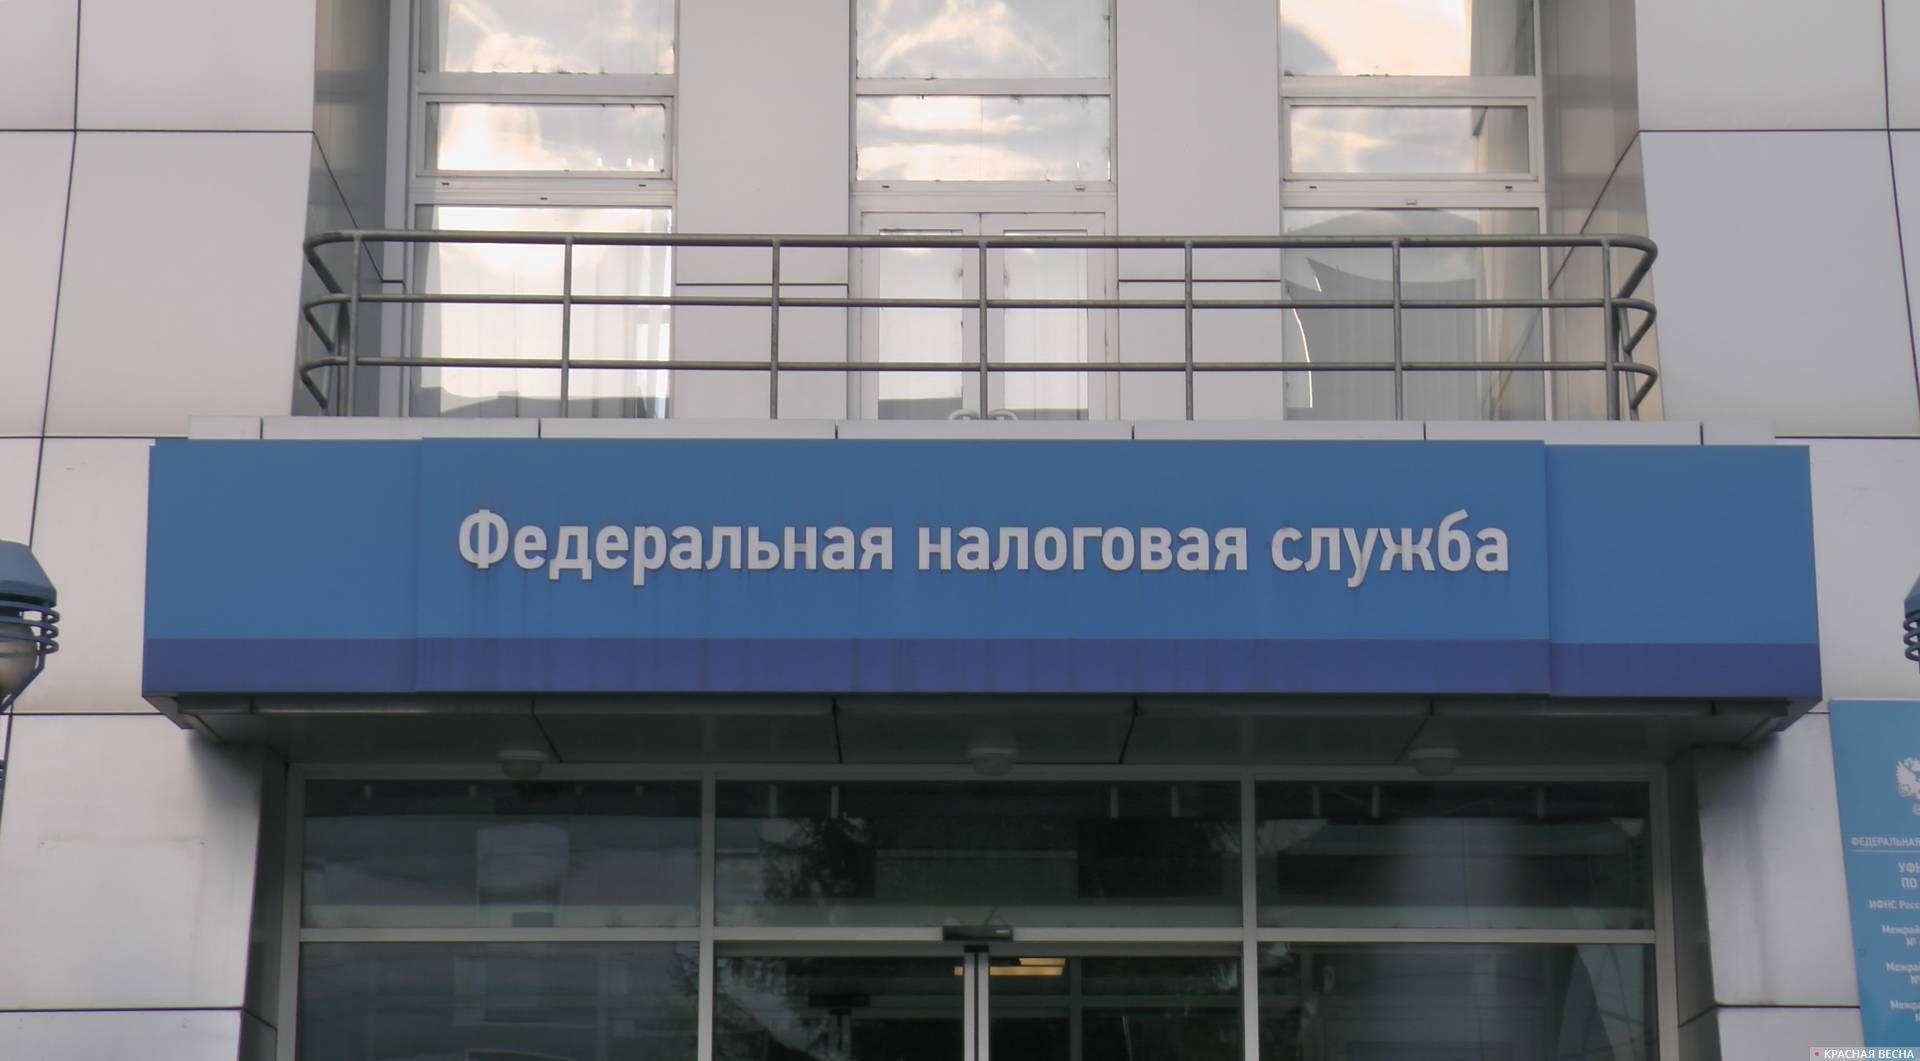 Налоговая служба. Москва. 2018